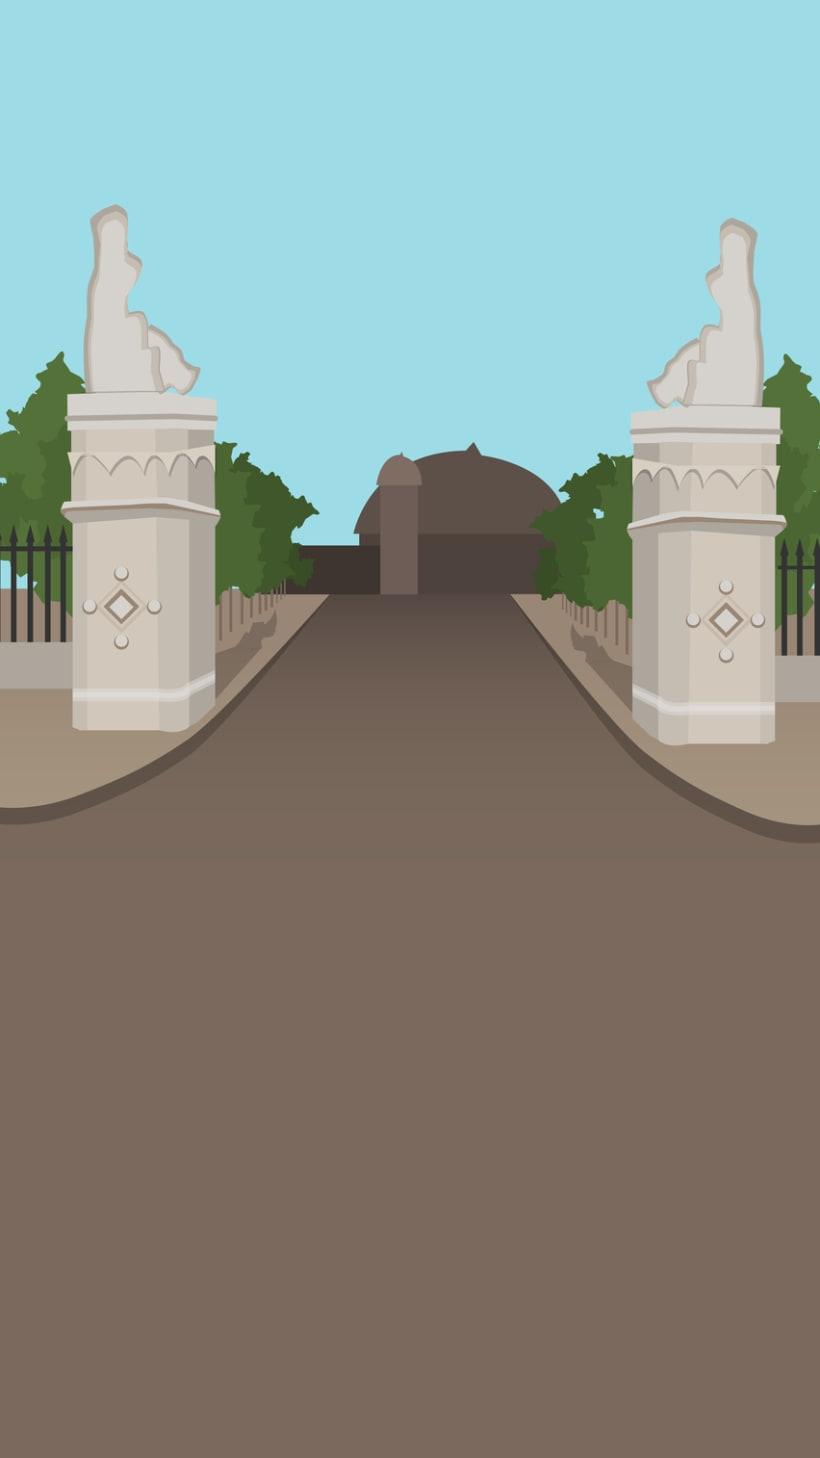 1714 - Videogame Design -1